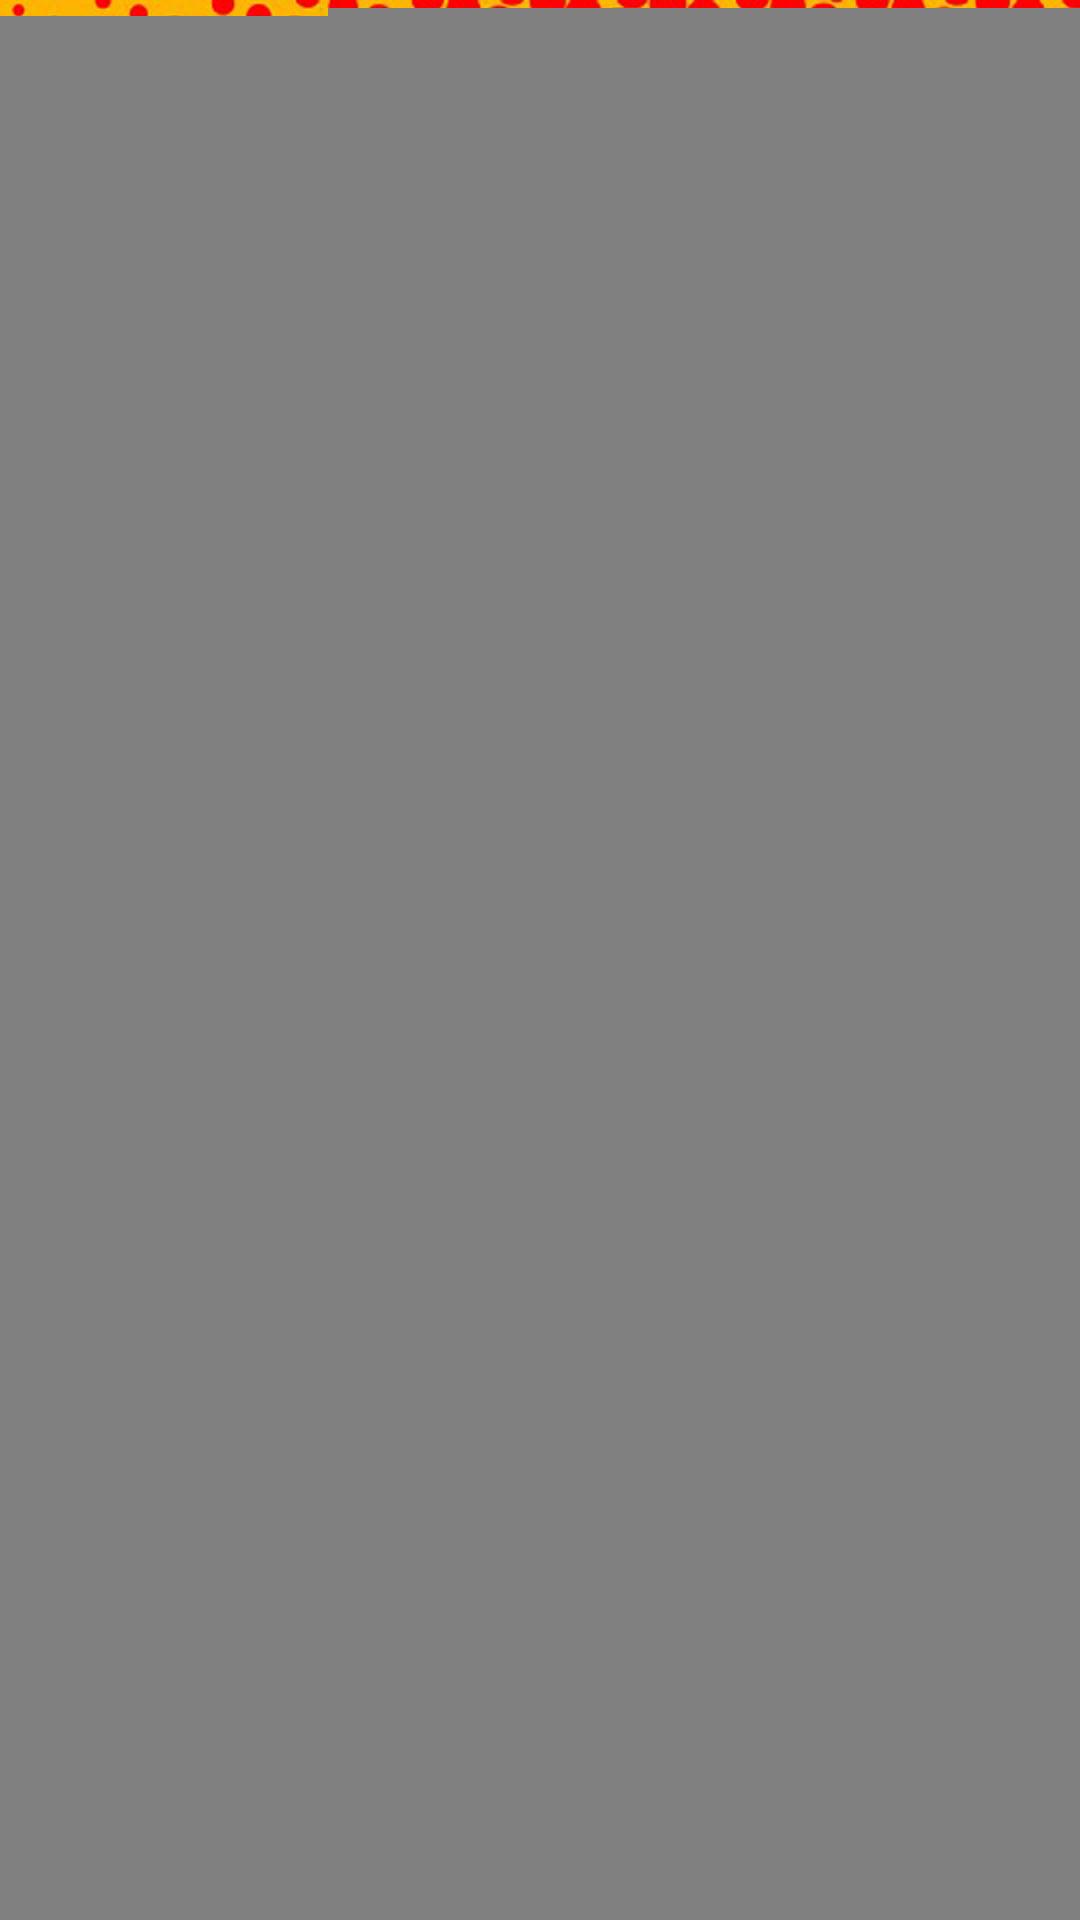 Background Dots Orange HD Wallpaper iPhone 6 plus